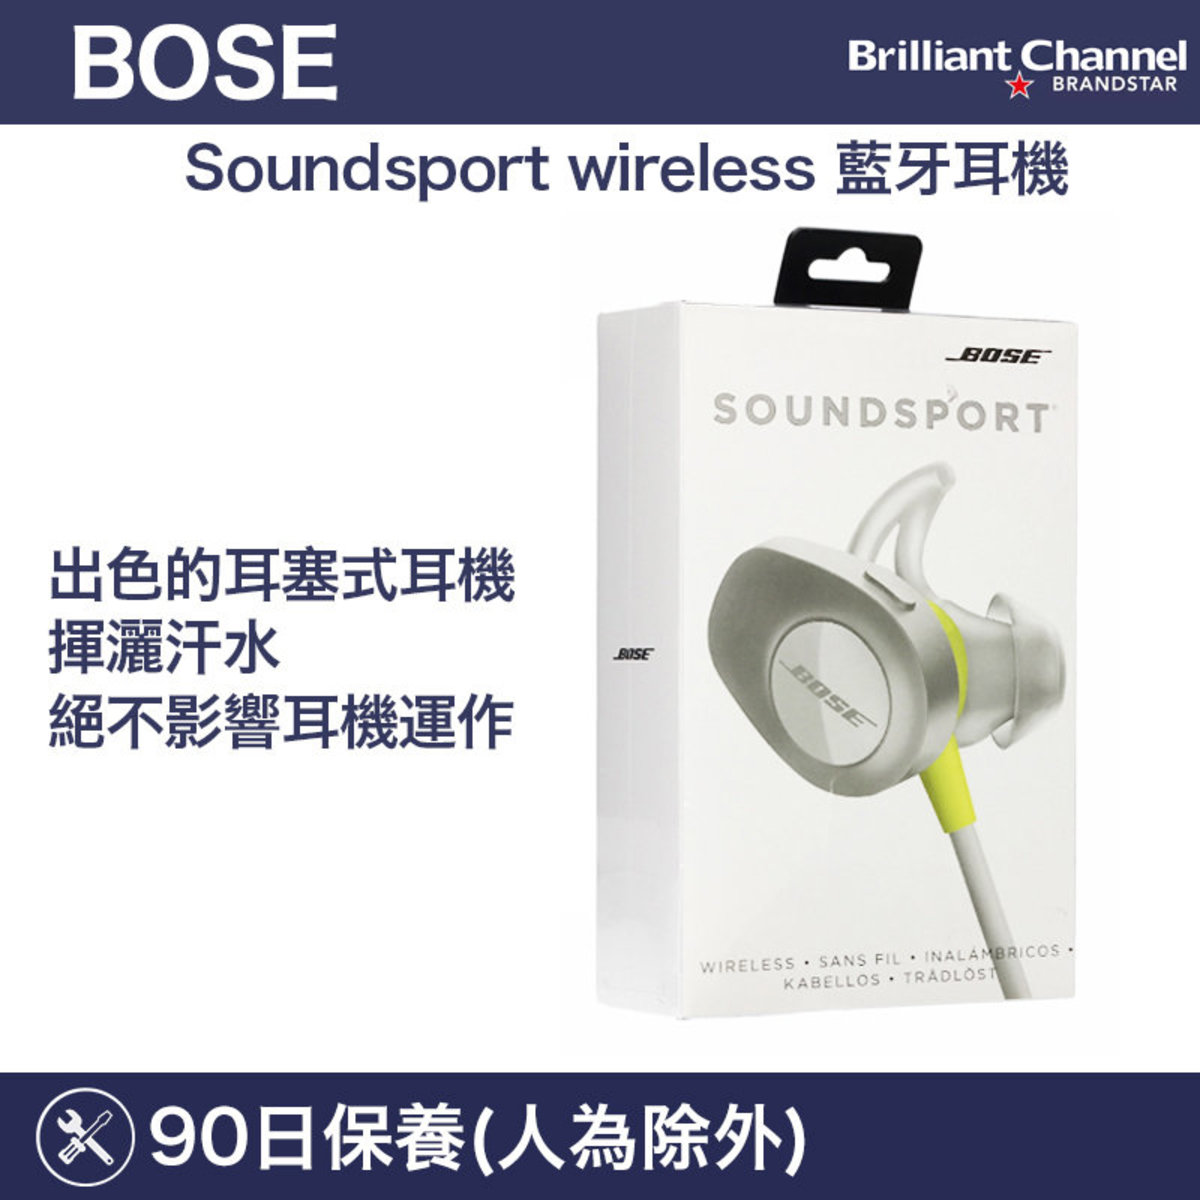 SoundSport wireless headphones (Yellow) (Parallel Import)